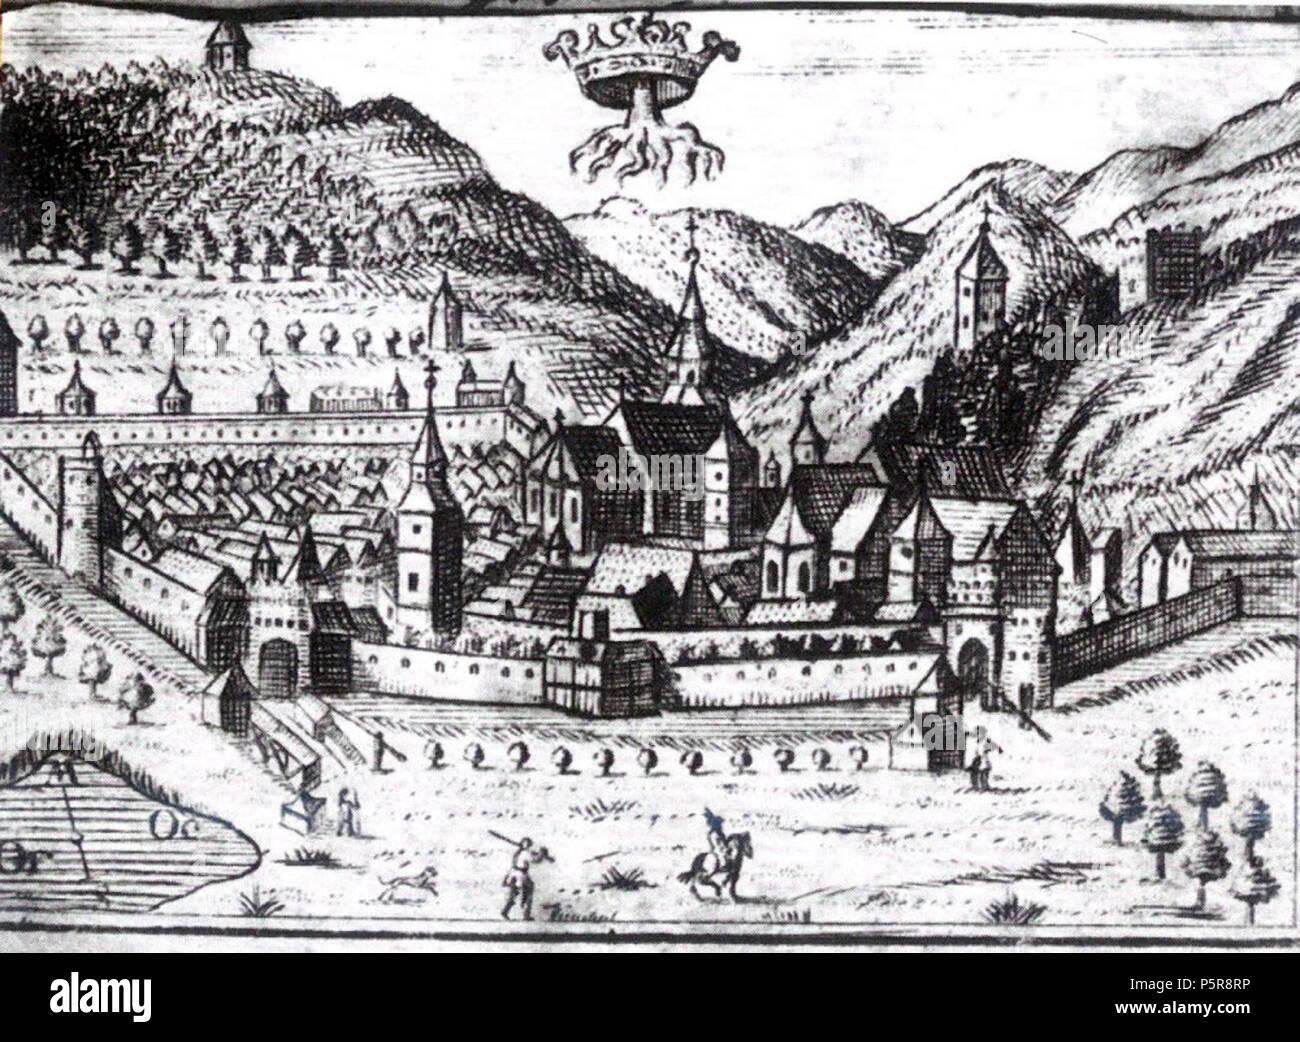 N A. Magyar  1750-es ábrázolás a városról. Brassó képe 1750-bl. This is a  photo of a historic monument in judeul Braov cbab671fee